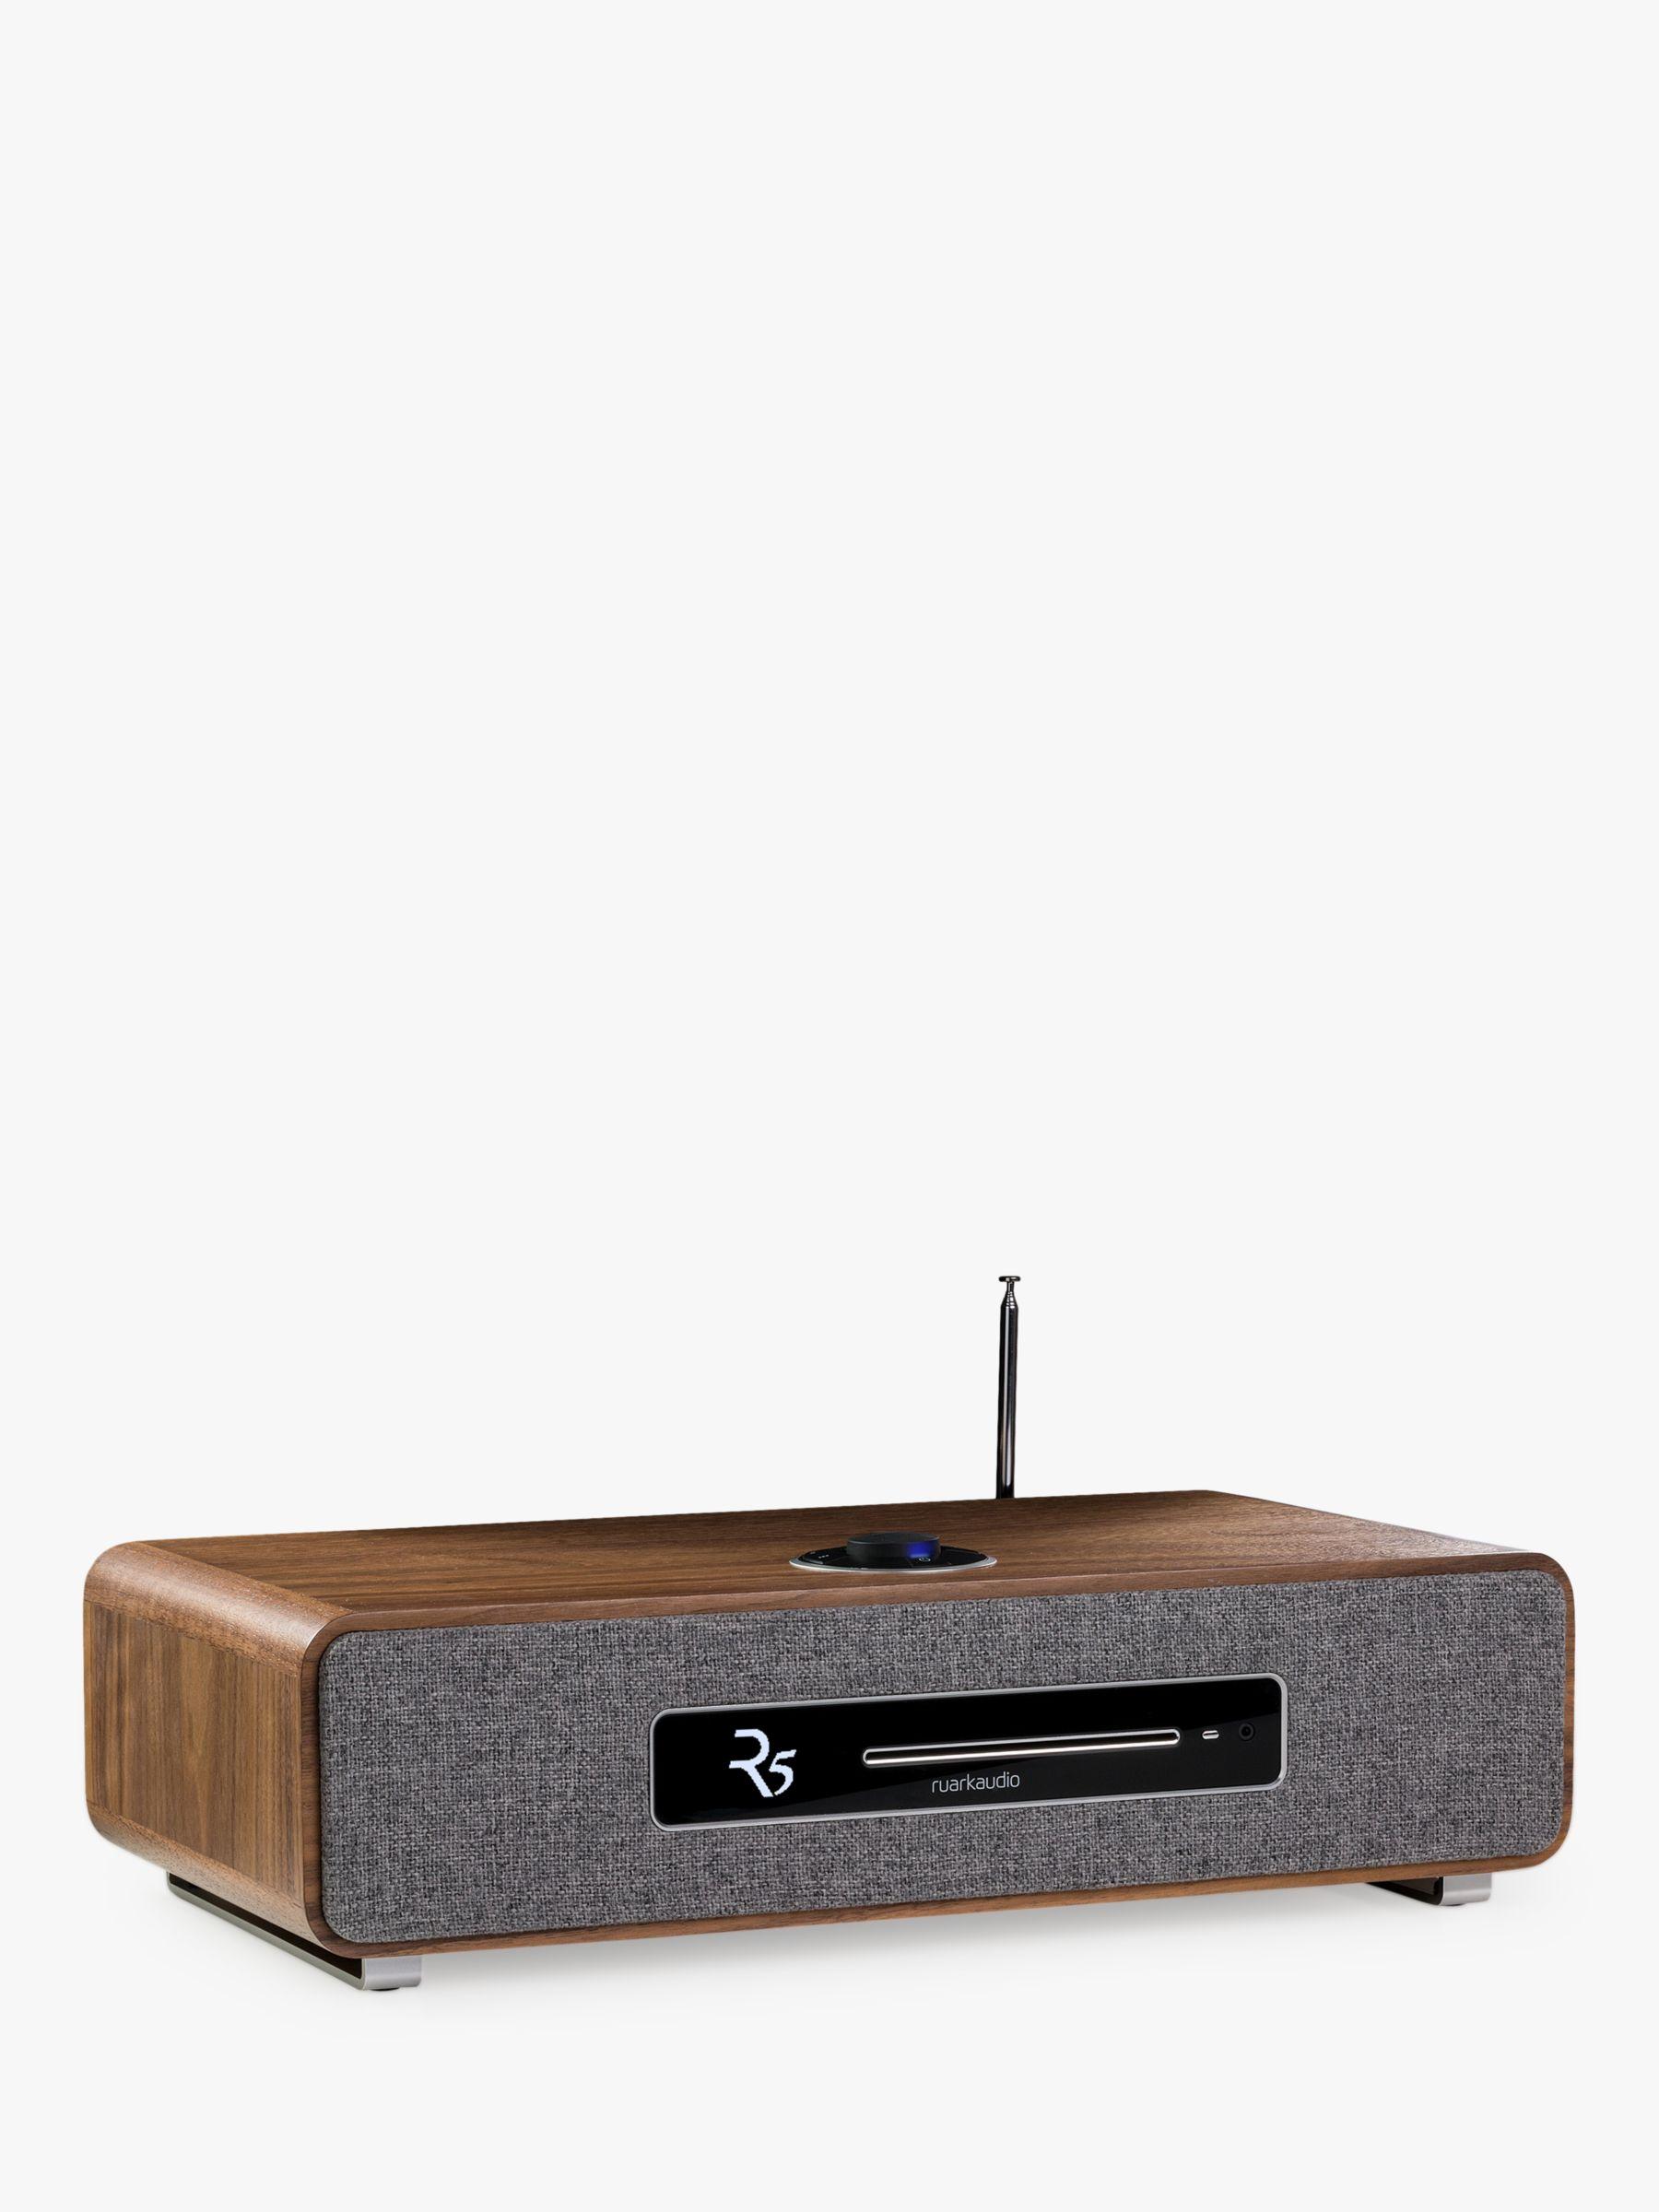 Ruark Audio Ruark R5 DAB/DAB+/FM/Internet Radio & CD Bluetooth Wi-Fi Wireless All-In-One Music System